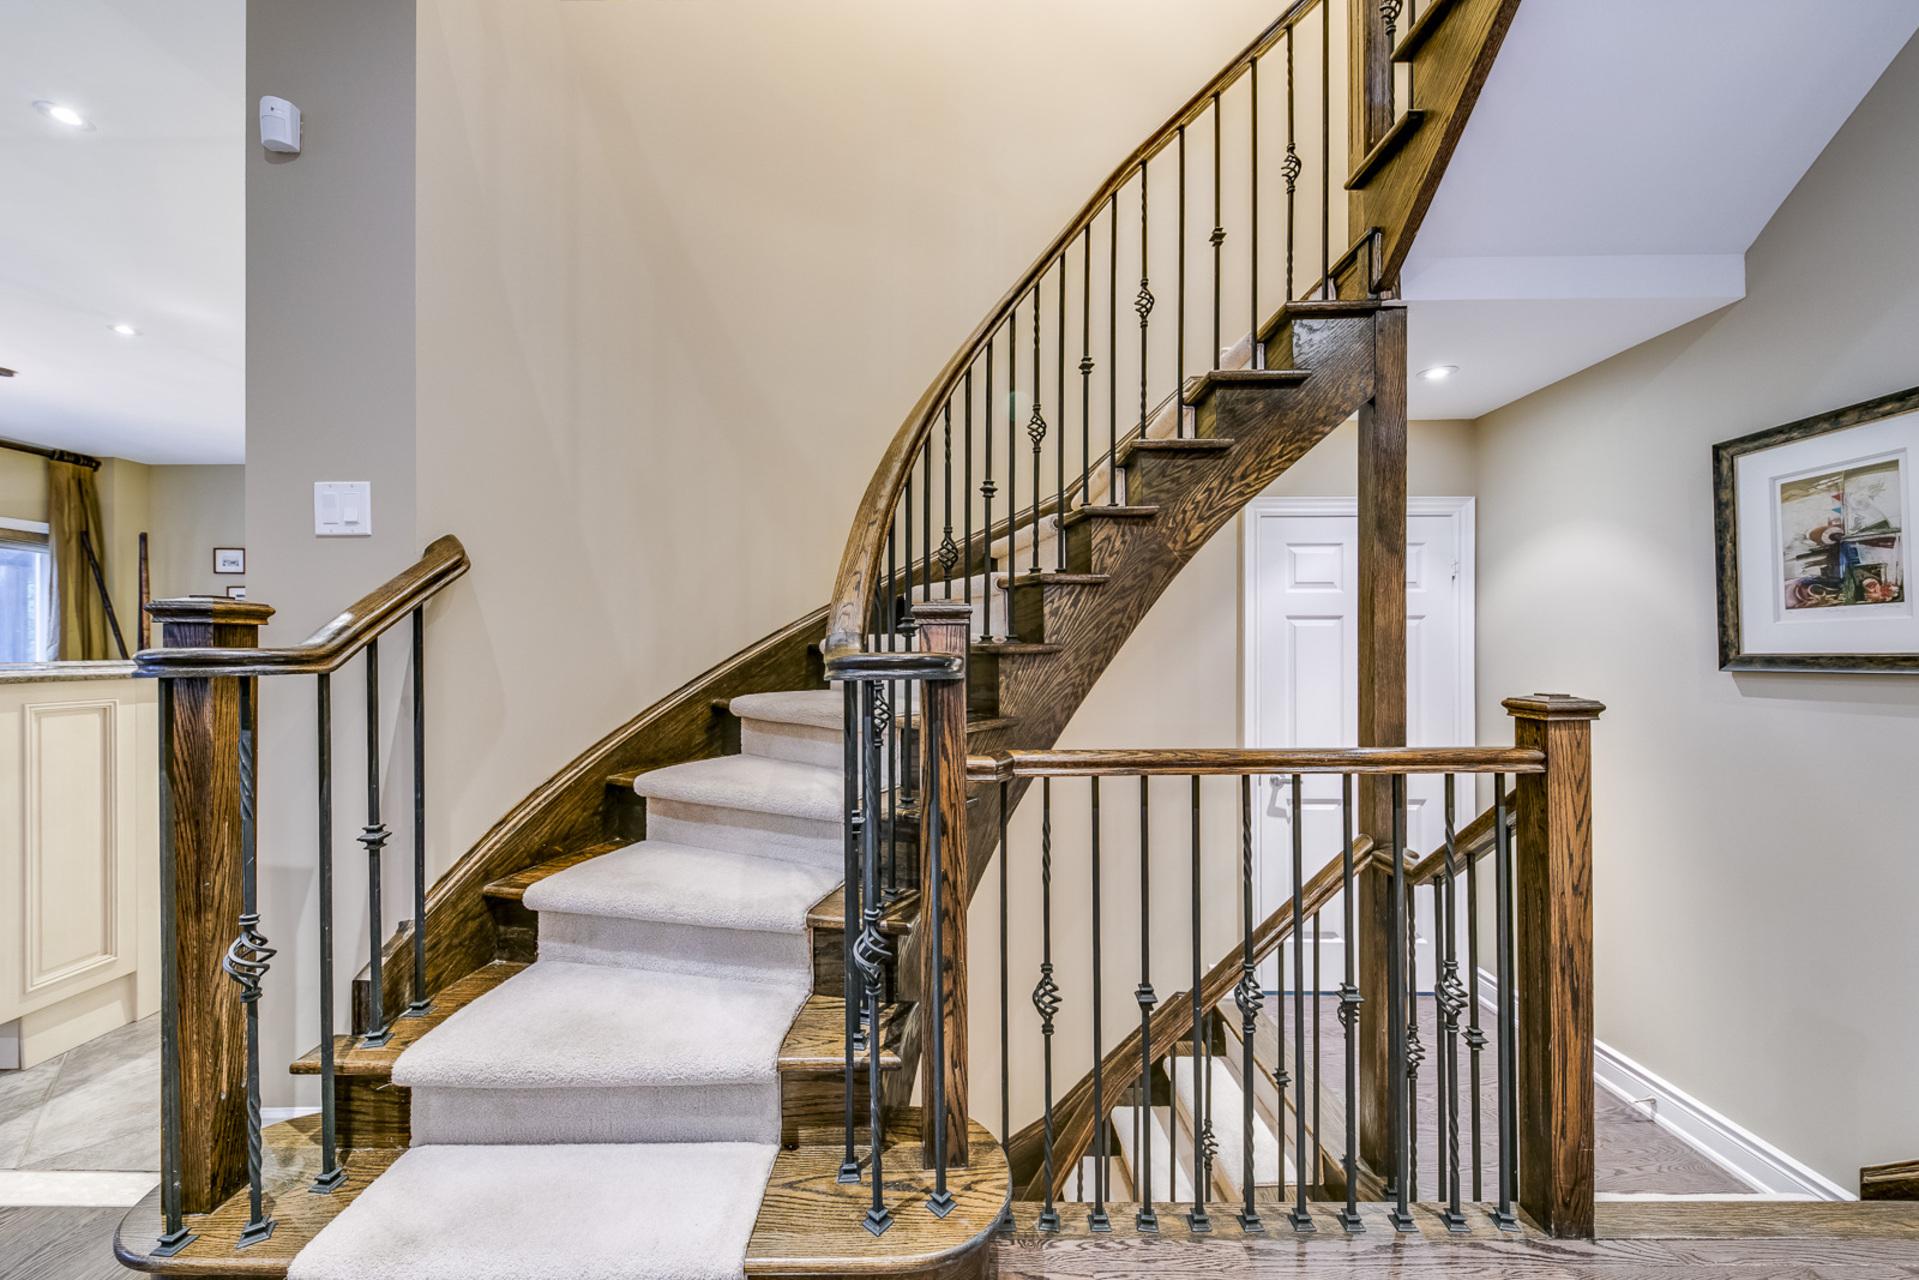 Stairs - 2460 Bon Echo Dr, Oakville - Elite3 & Team at 2460 Bon Echo Drive, Iroquois Ridge North, Oakville